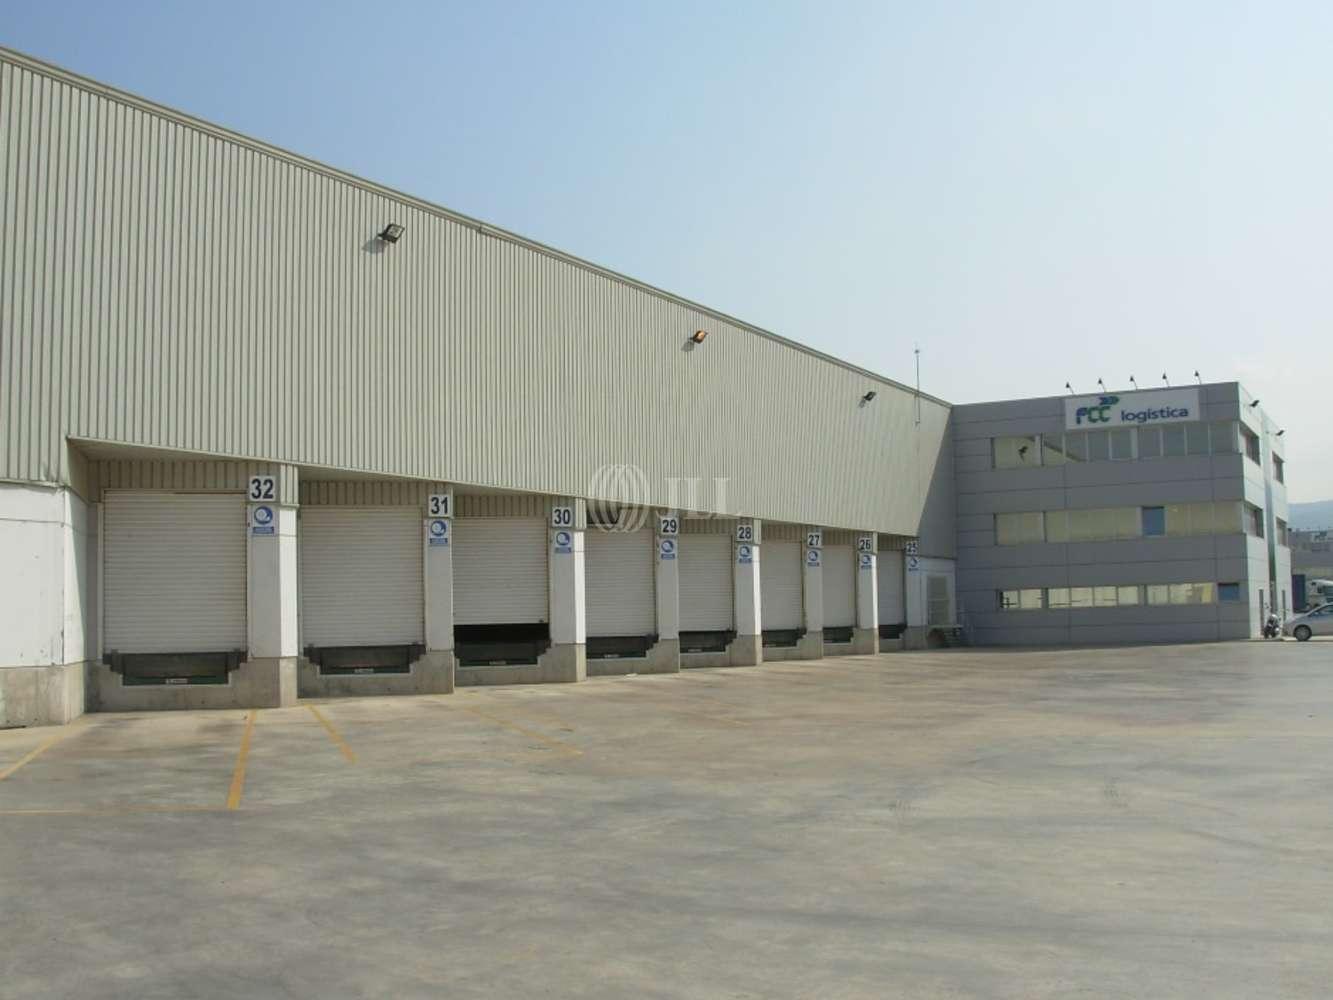 Naves industriales y logísticas Subirats, 08739 - Nave Logistica - B0192 - LOGISPARK - 3435